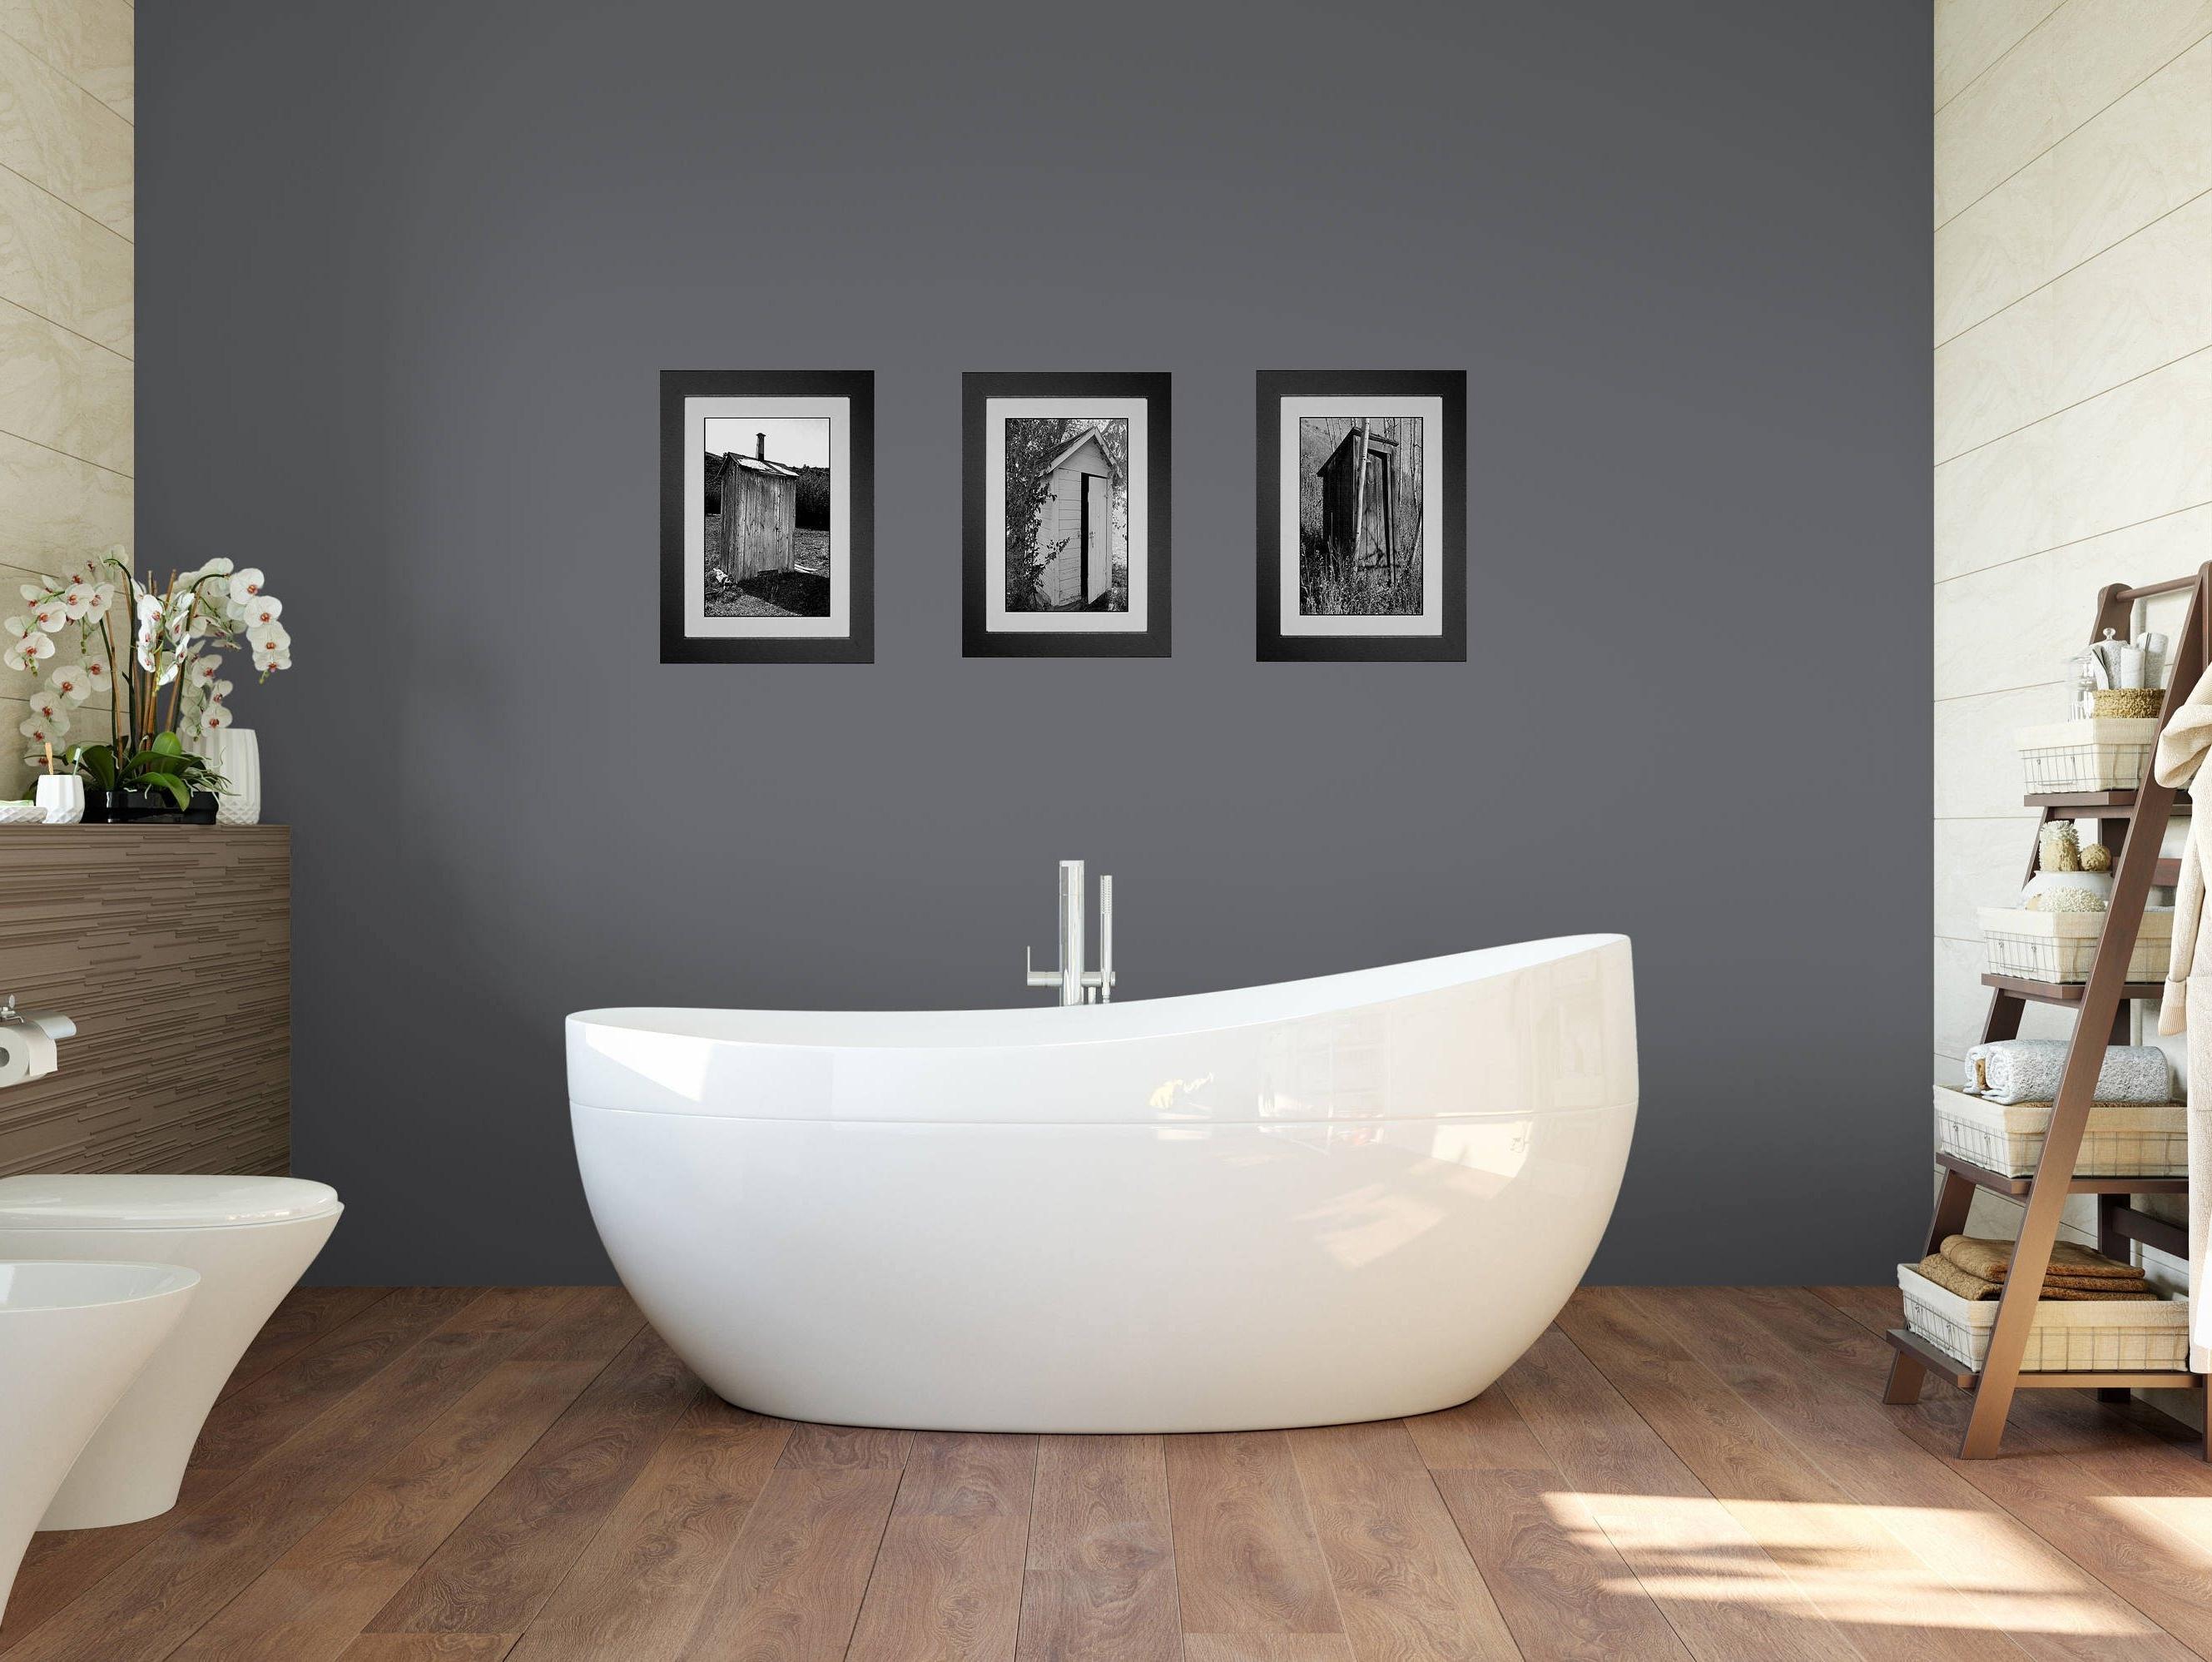 Funny Bathroom Art, Bathroom Wall Art, 3 Print Set, Framed Prints Throughout Latest Wall Art For Bathroom (View 6 of 20)